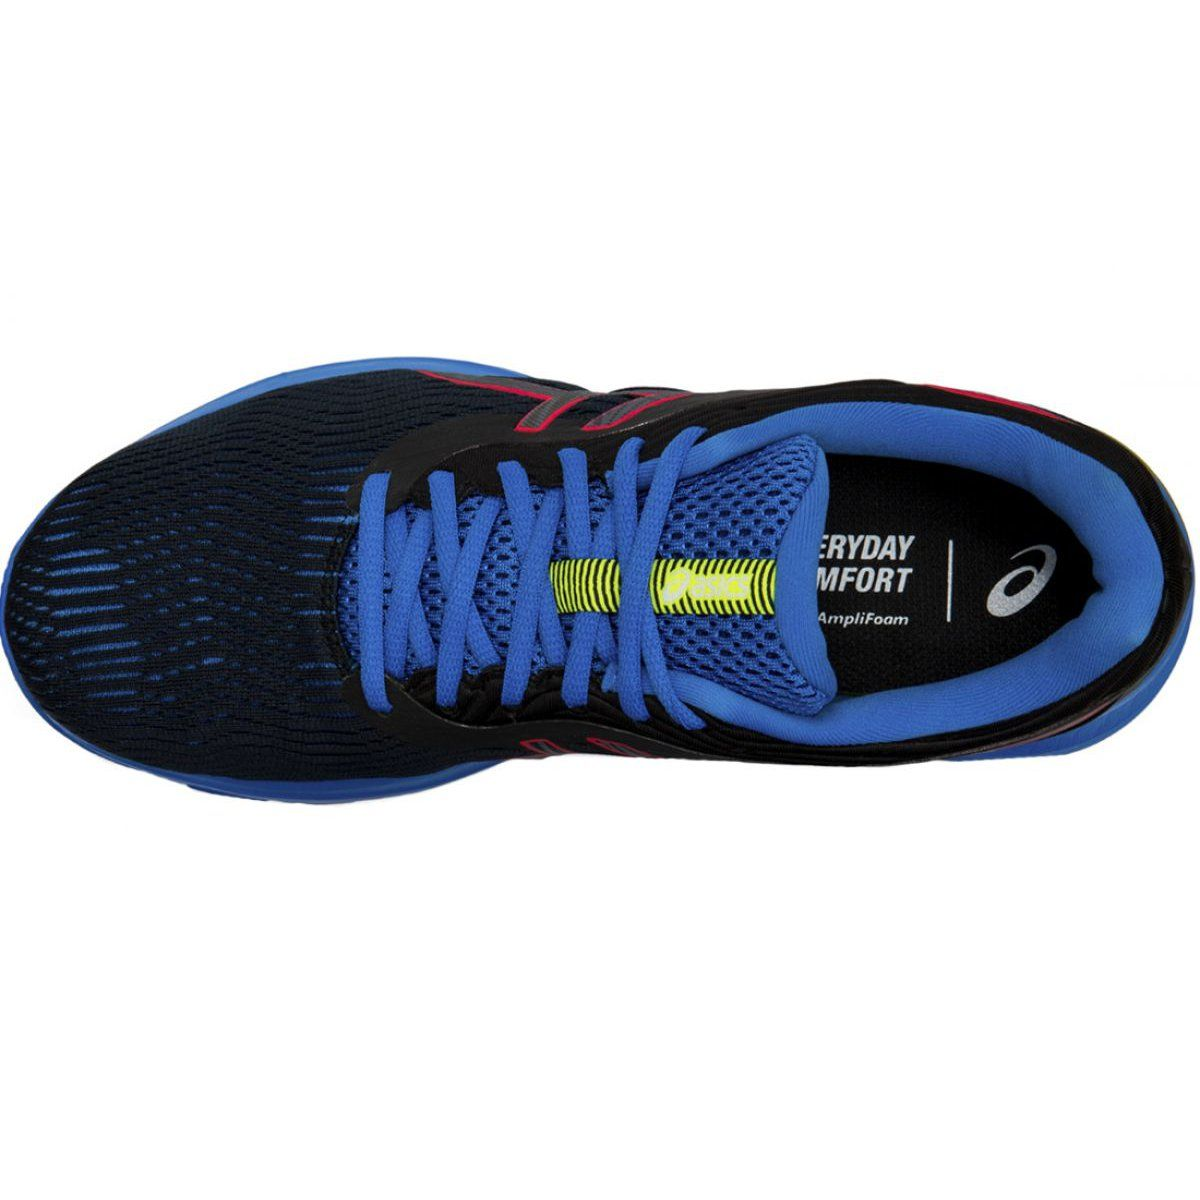 Buty Do Biegania Asics Gel Pulse 11 Ls M 1011a645 001 Czarne Asics Gel Pulse Black Running Shoes Asics Gel